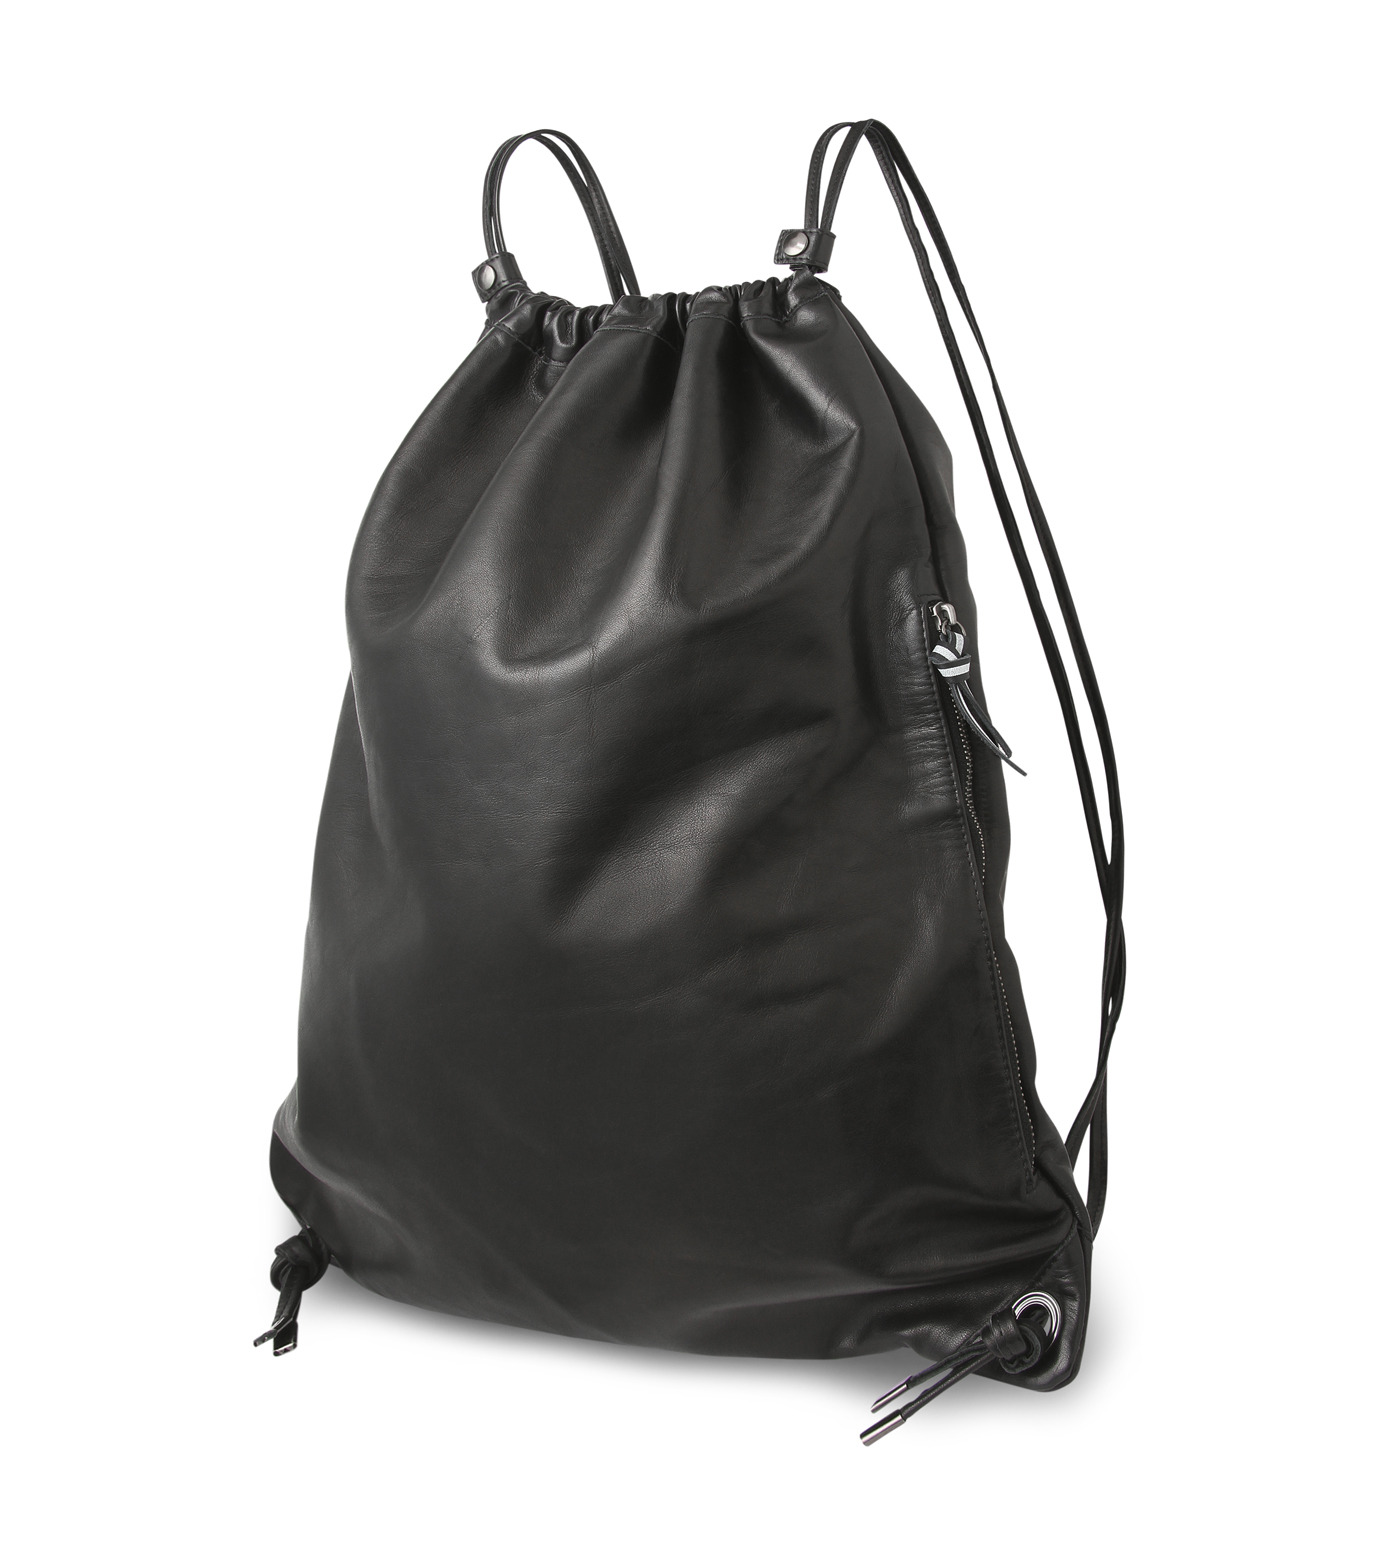 HL HEDDIE LOVU(エイチエル・エディールーヴ)のLEATHER KNAP SAC-BLACK(バッグ/bag)-17A900008-13 拡大詳細画像2